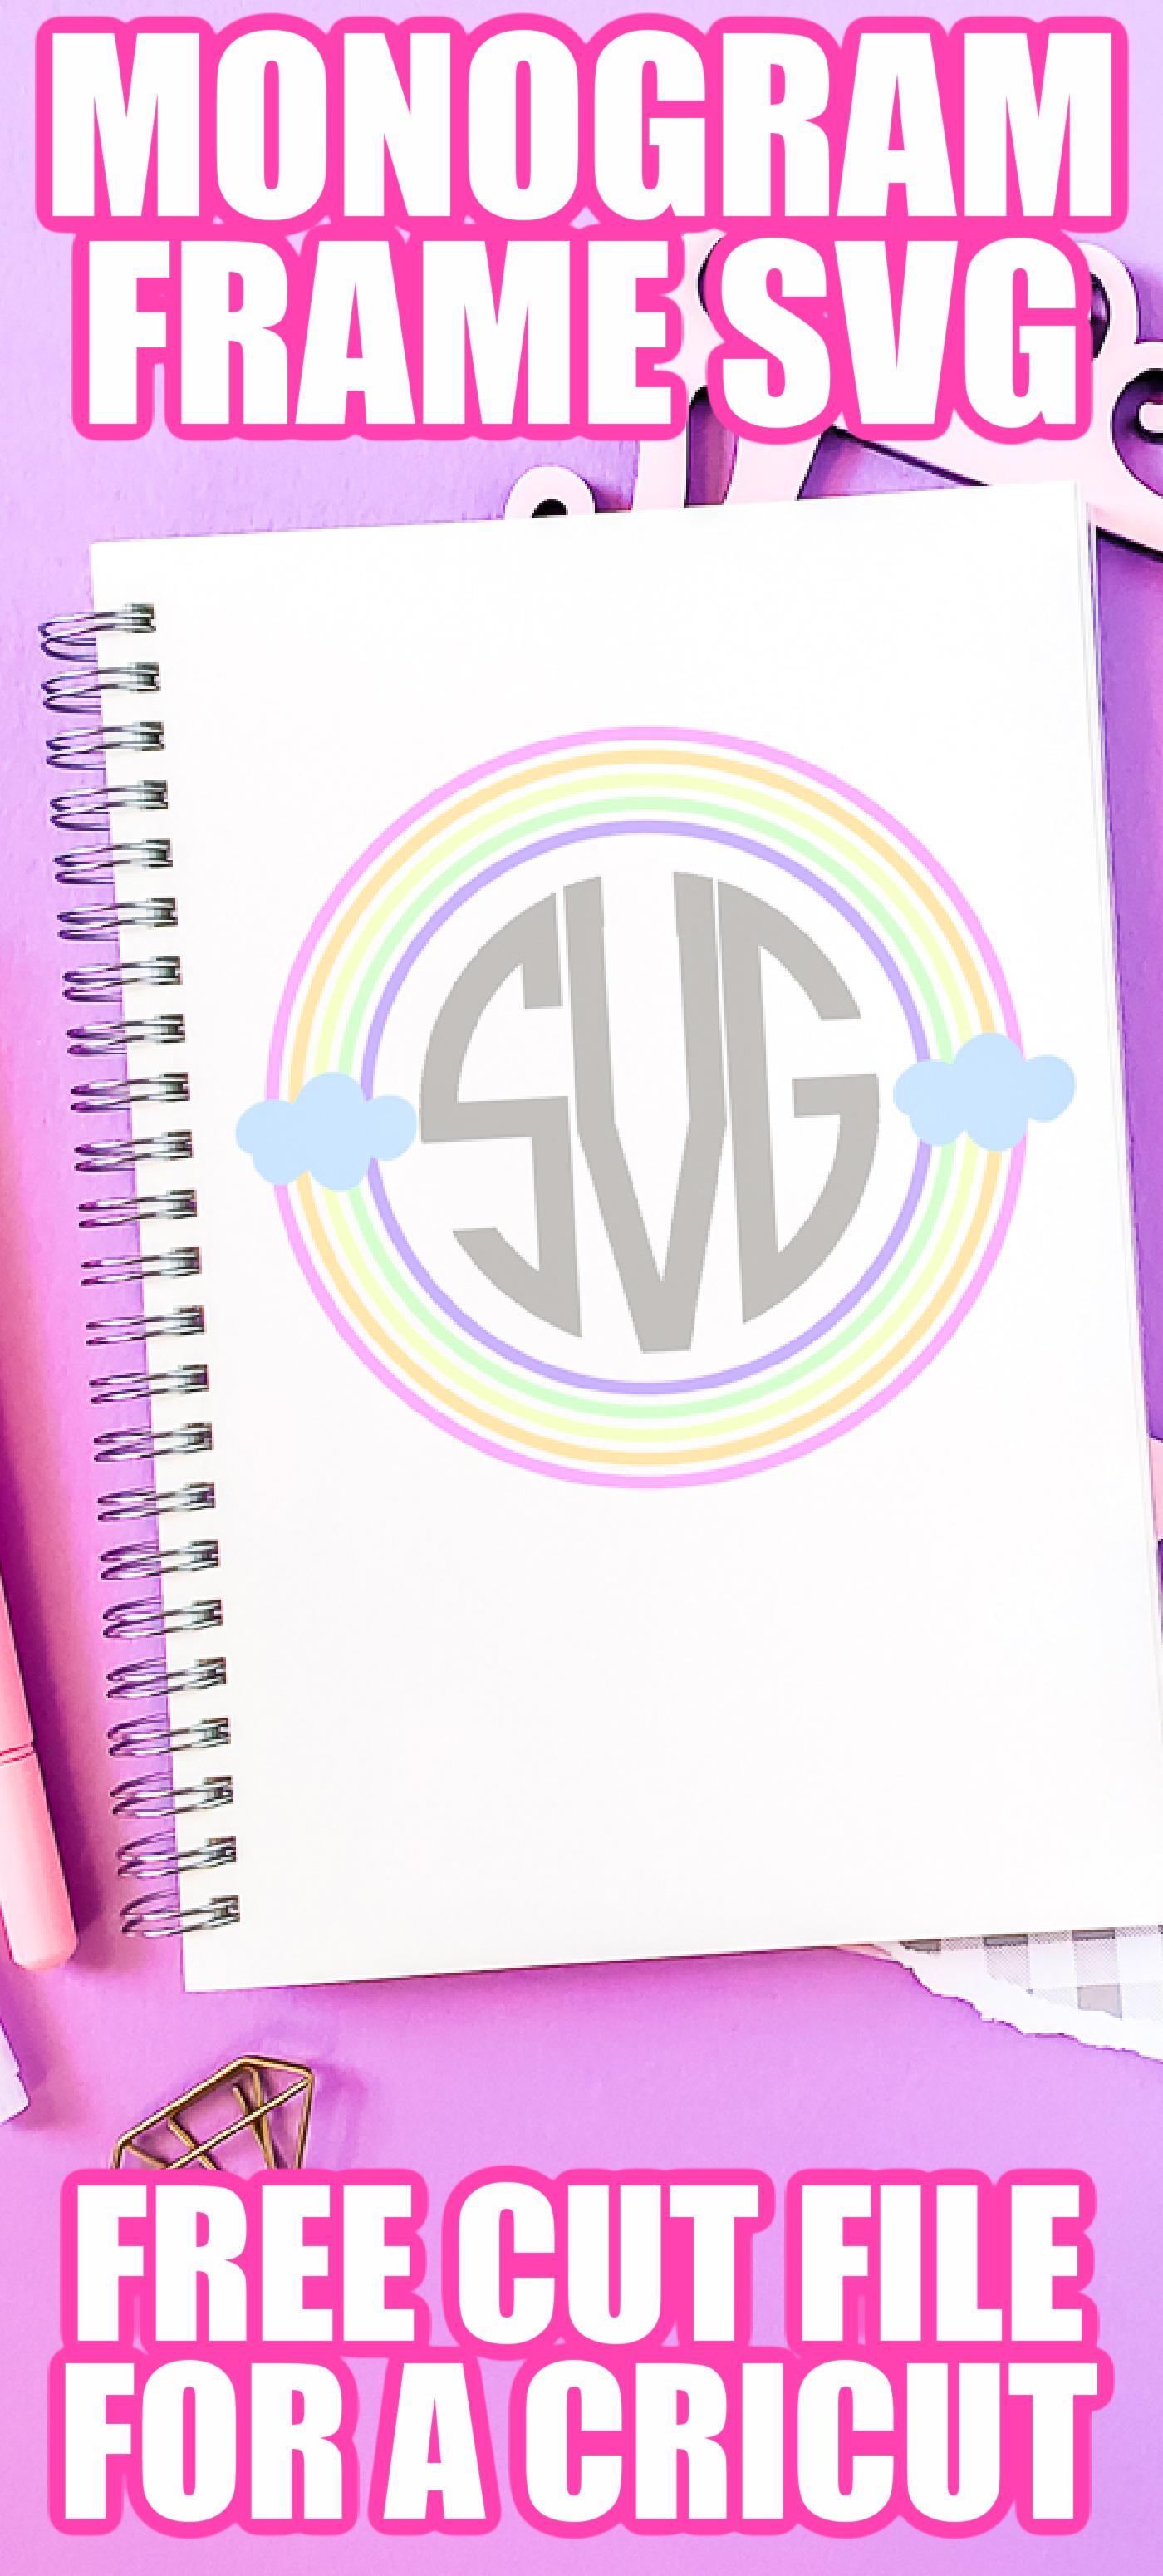 rainbow monogram frame svg